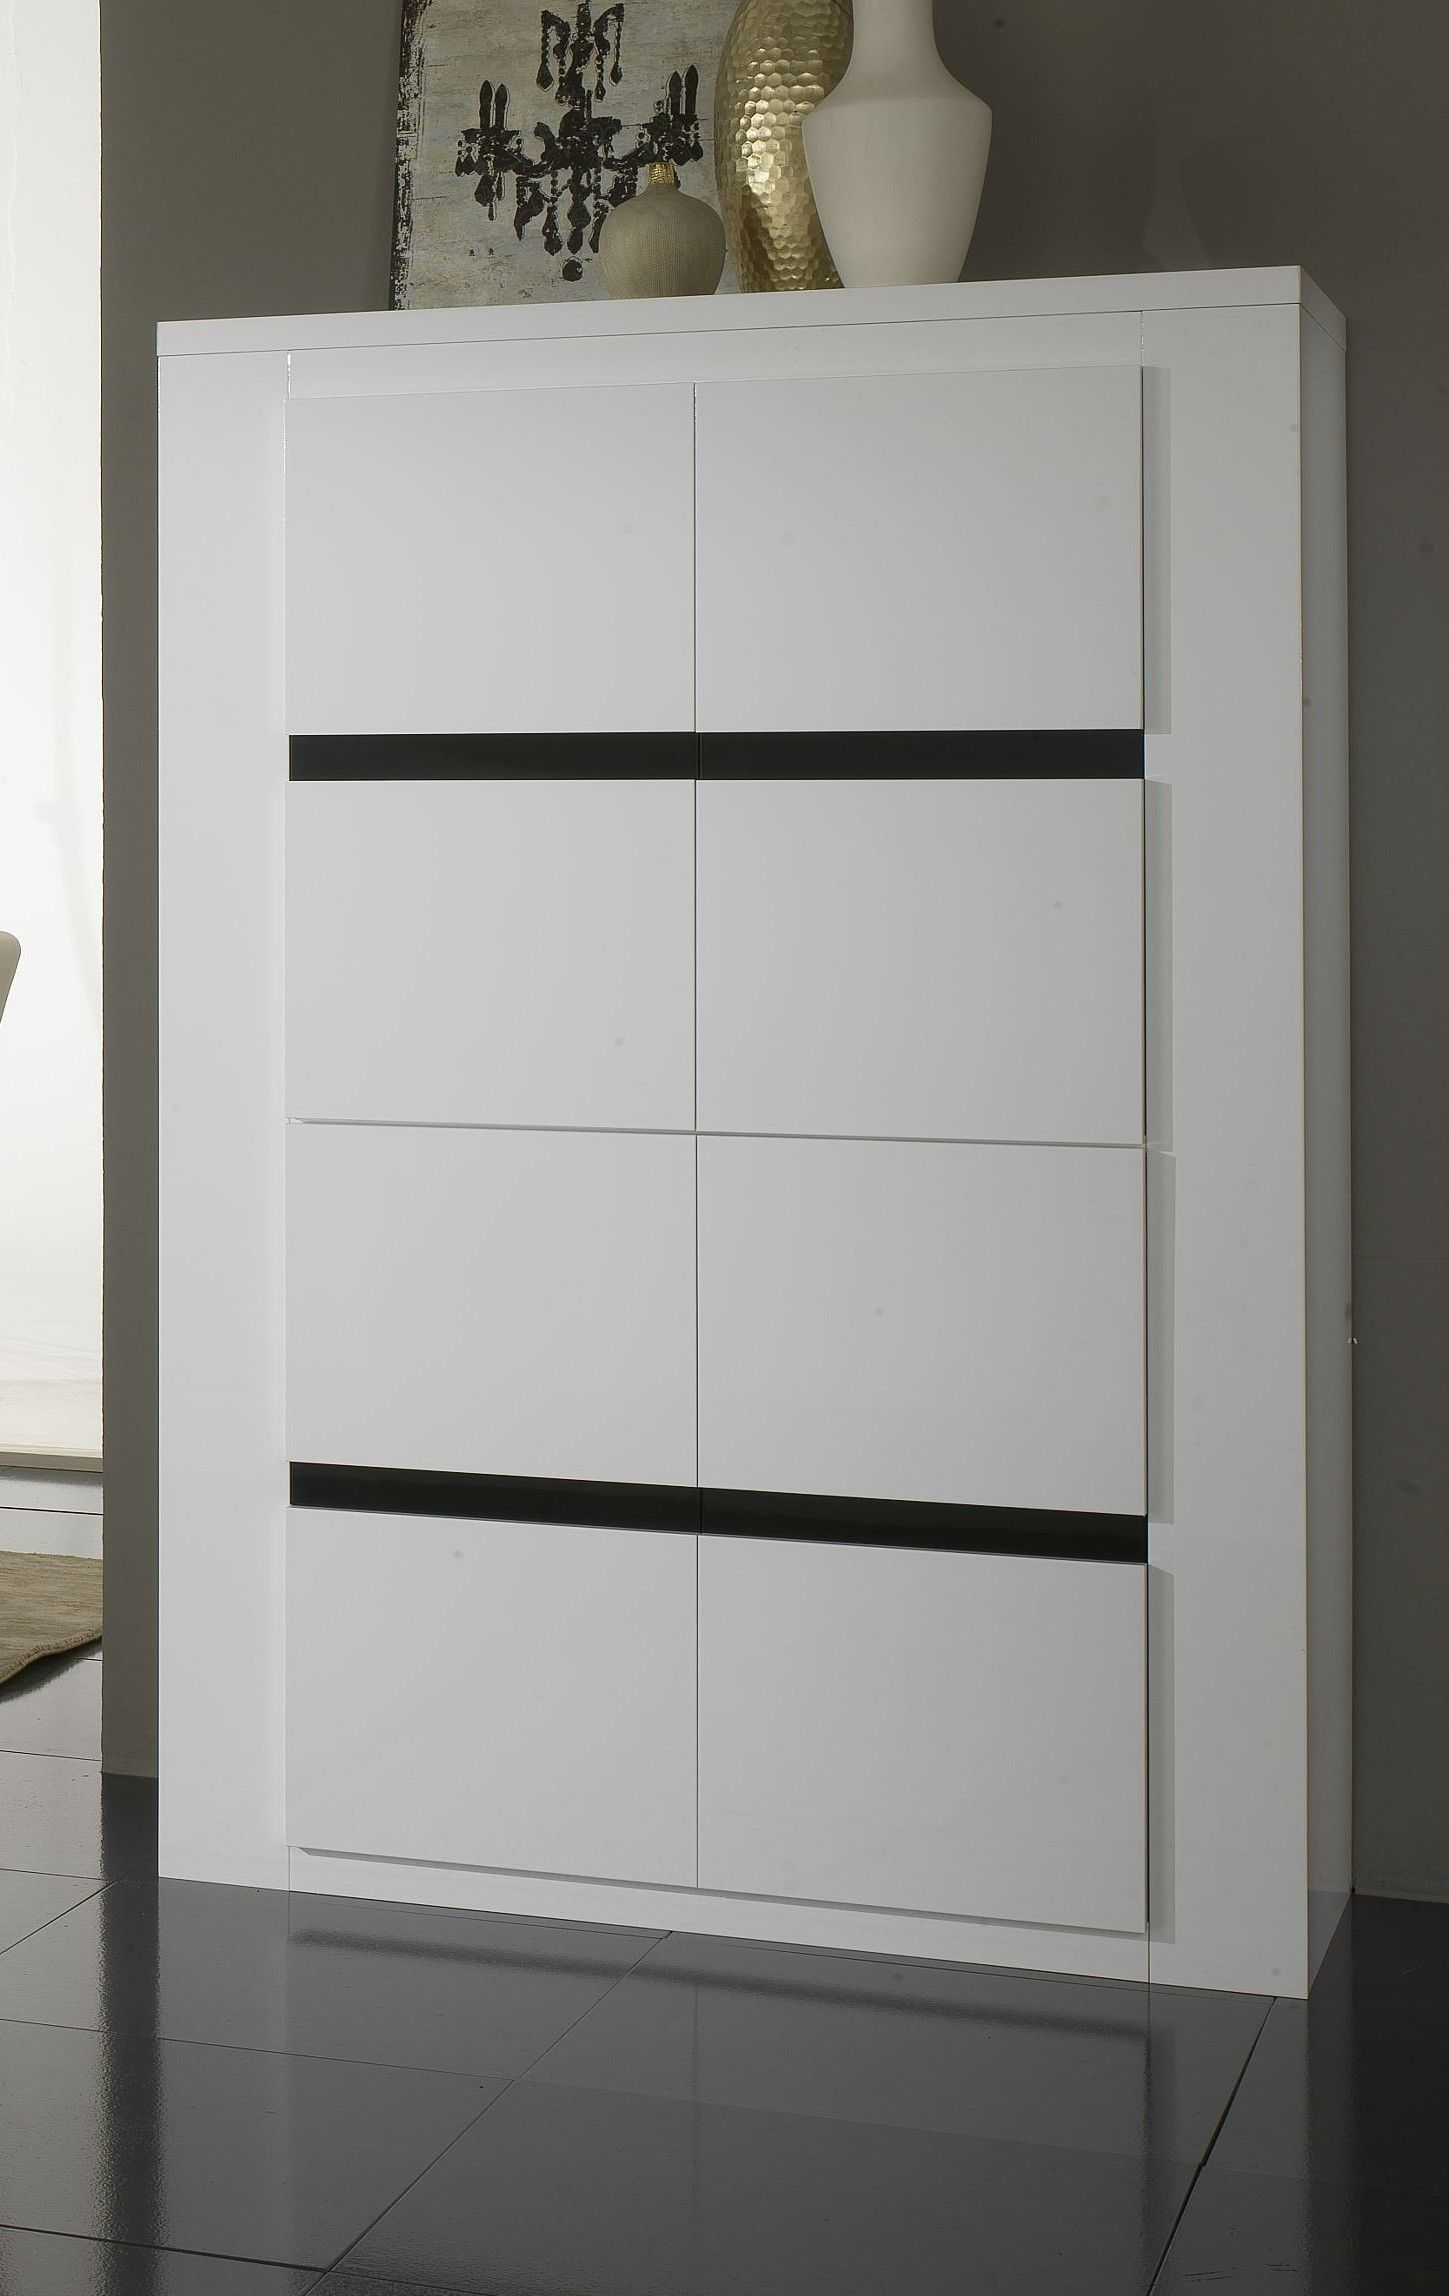 Buffet Haut Laqu Blanc Design Clara Buffet Haut Moderne Design  # Petit Meuble Bas Laque Blanc Design